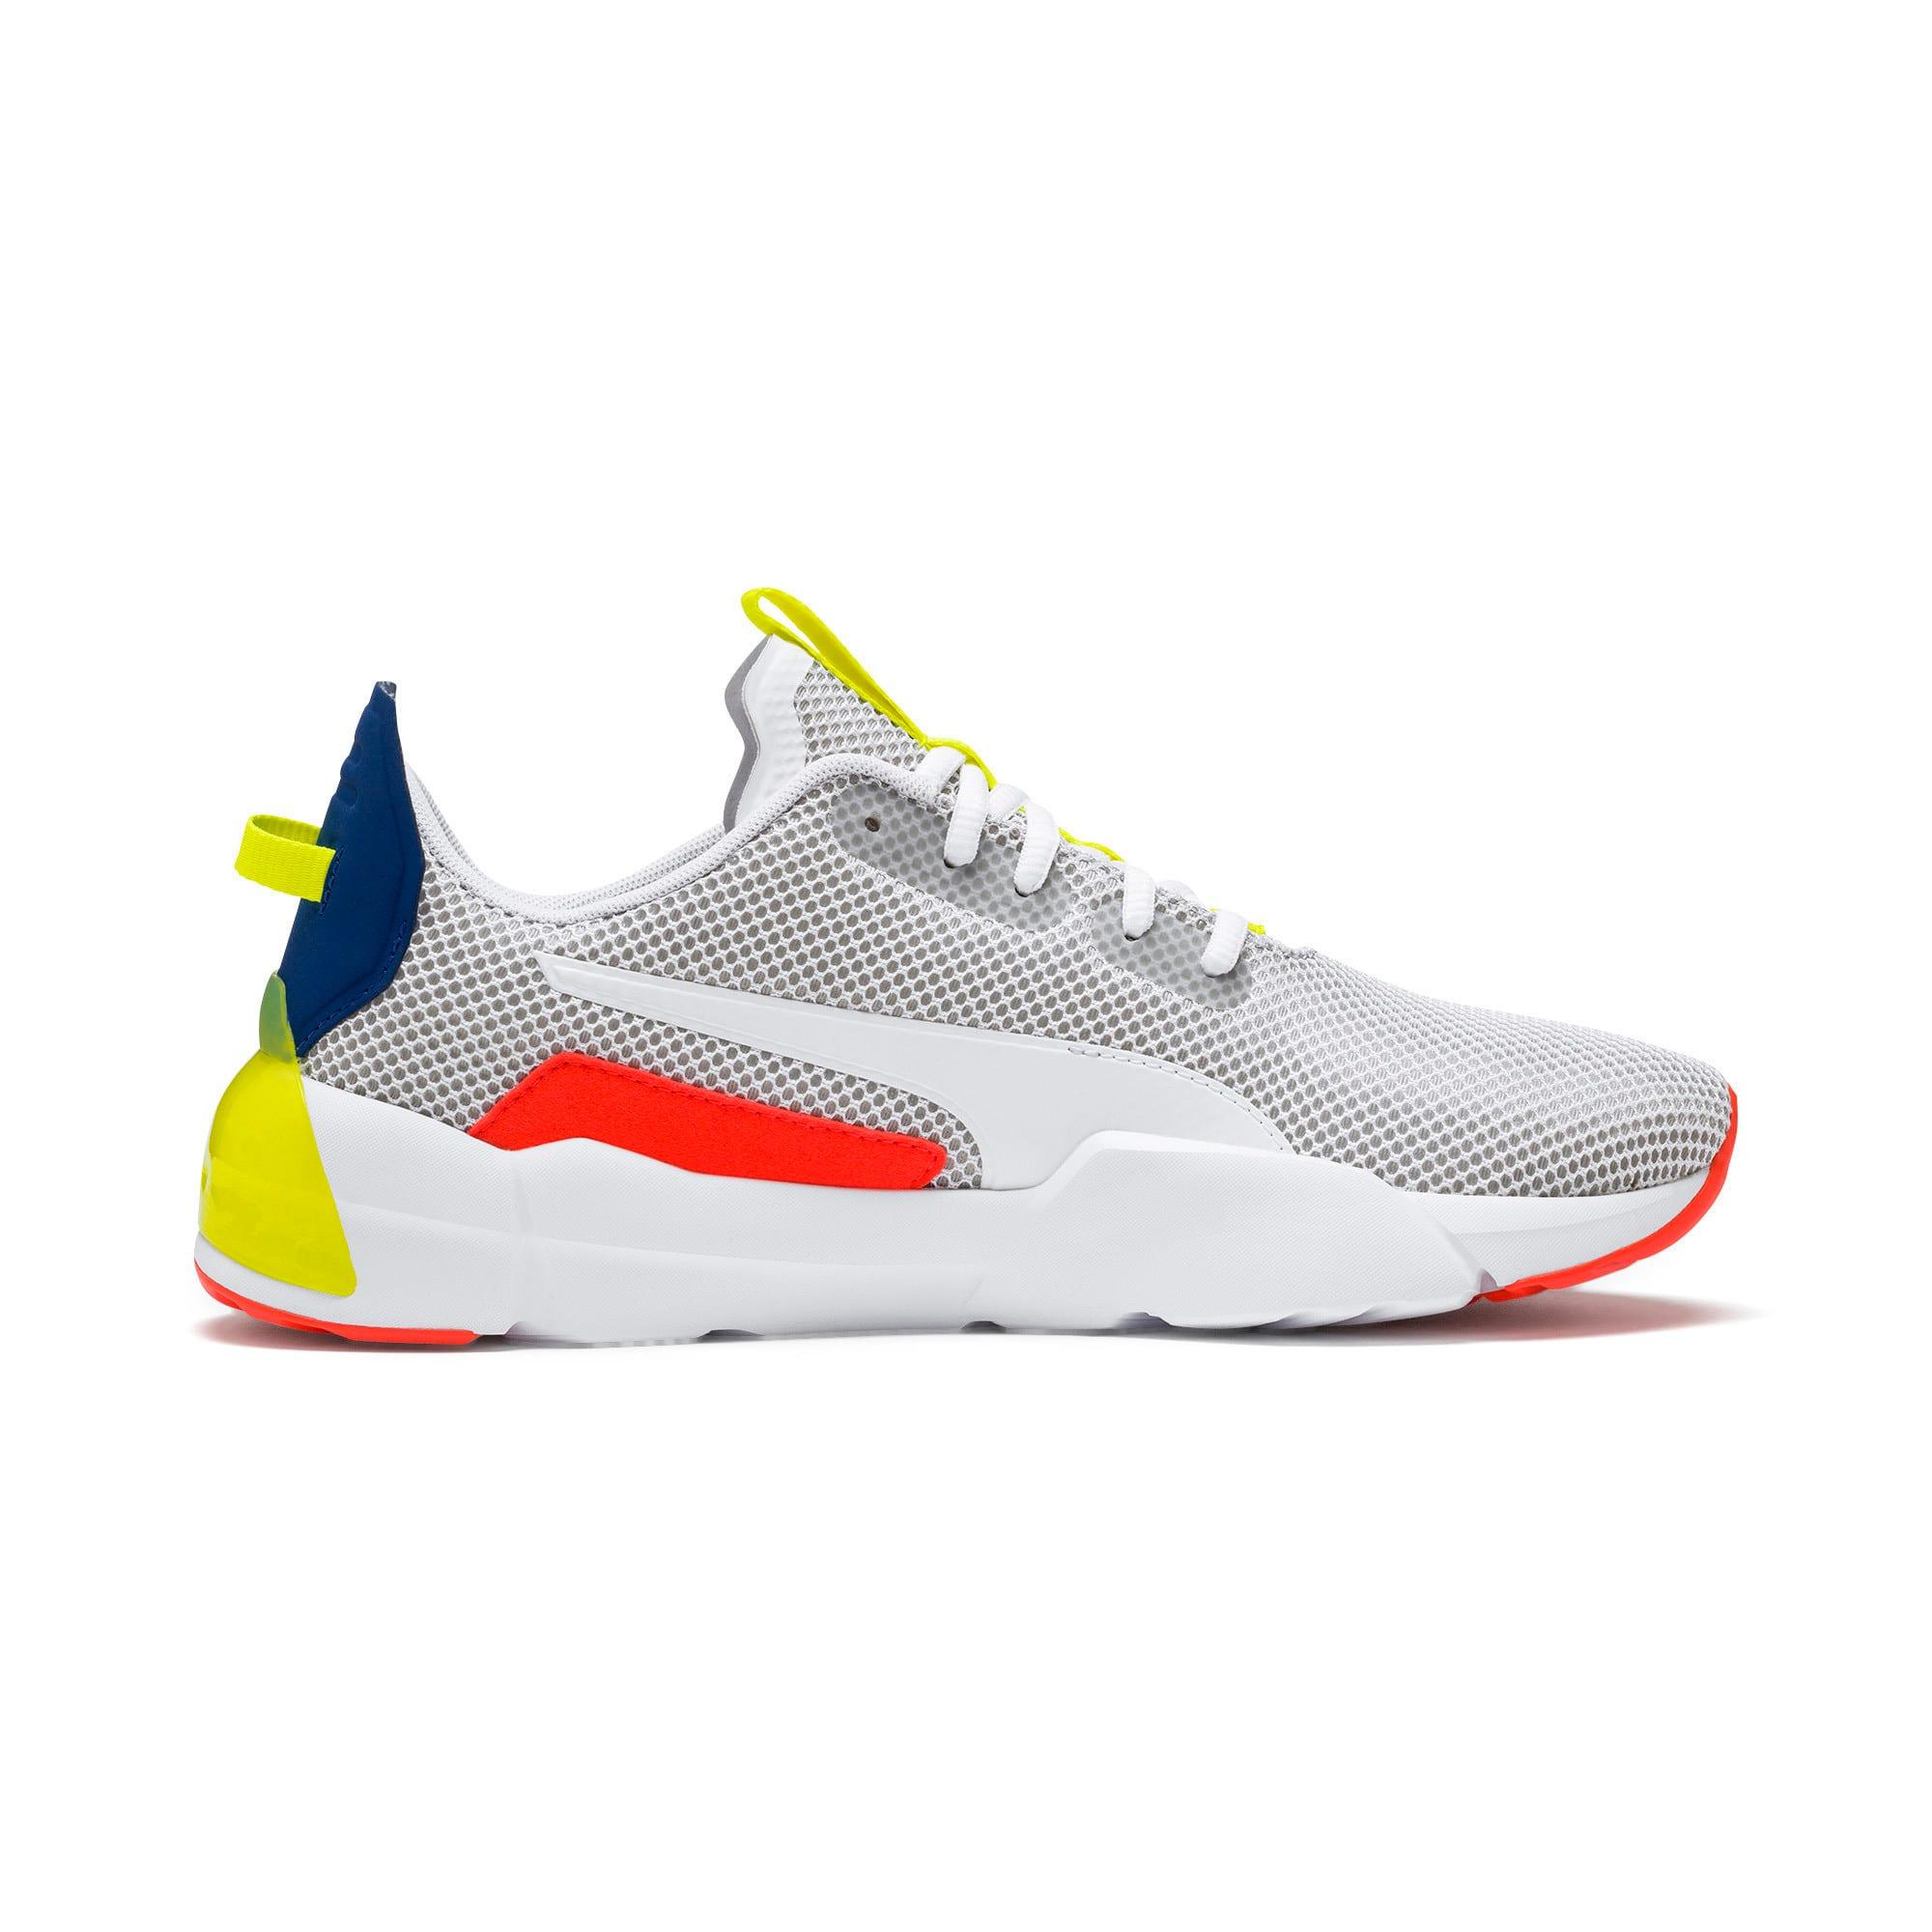 Thumbnail 6 of CELL Phase Men's Training Shoes, White-GalaxyBlue-YellowAlert, medium